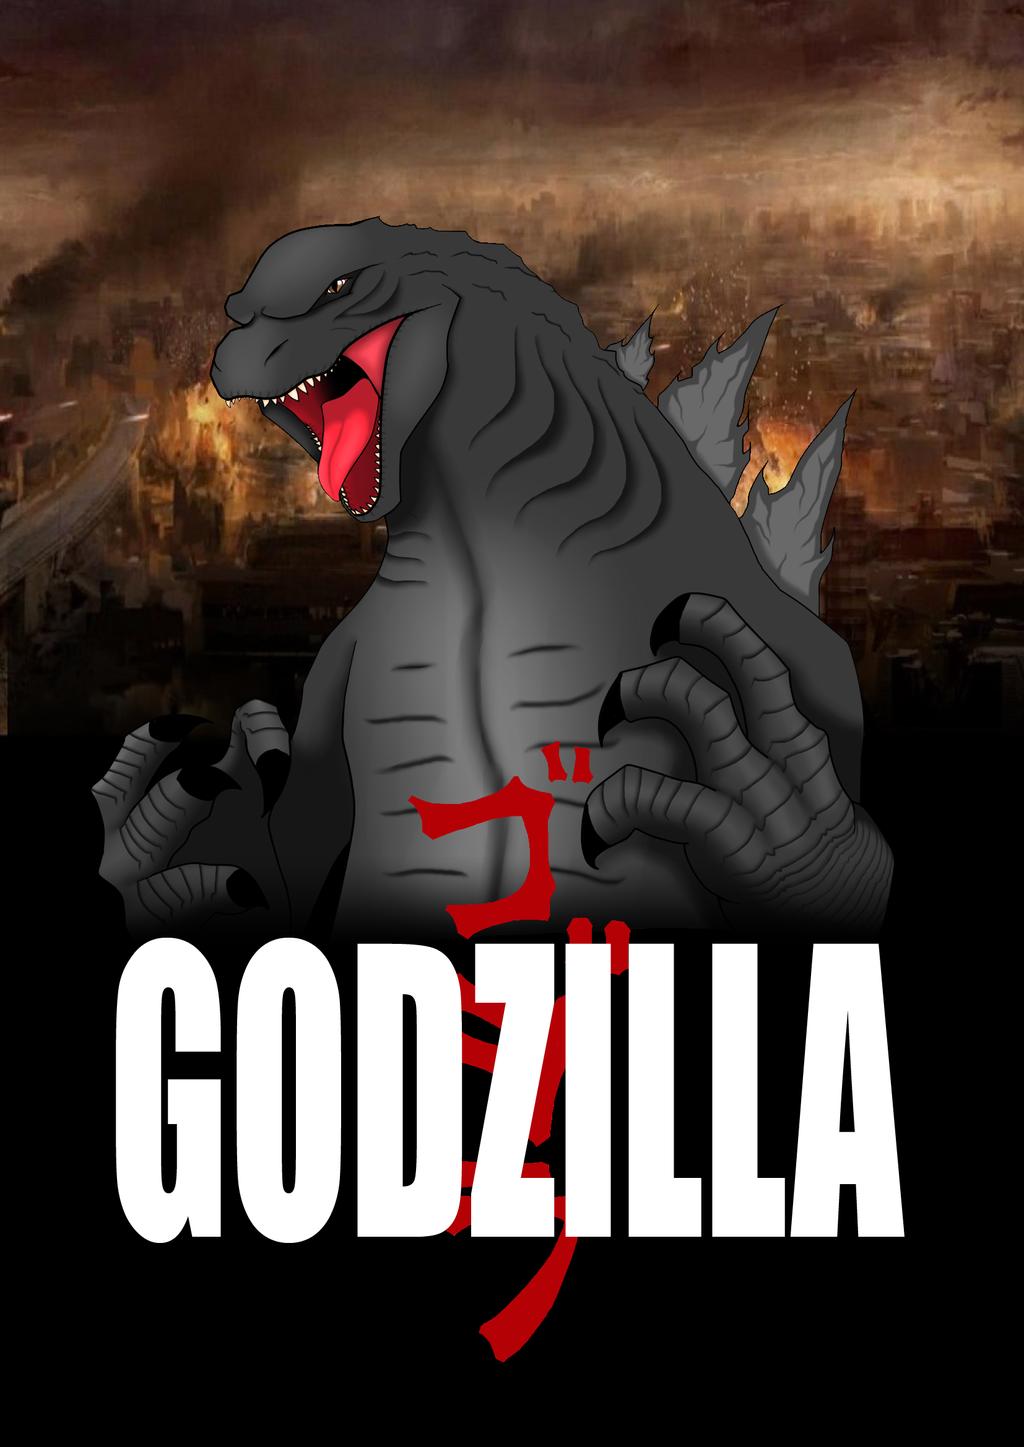 Godzilla 2014 by CrazyNat2012